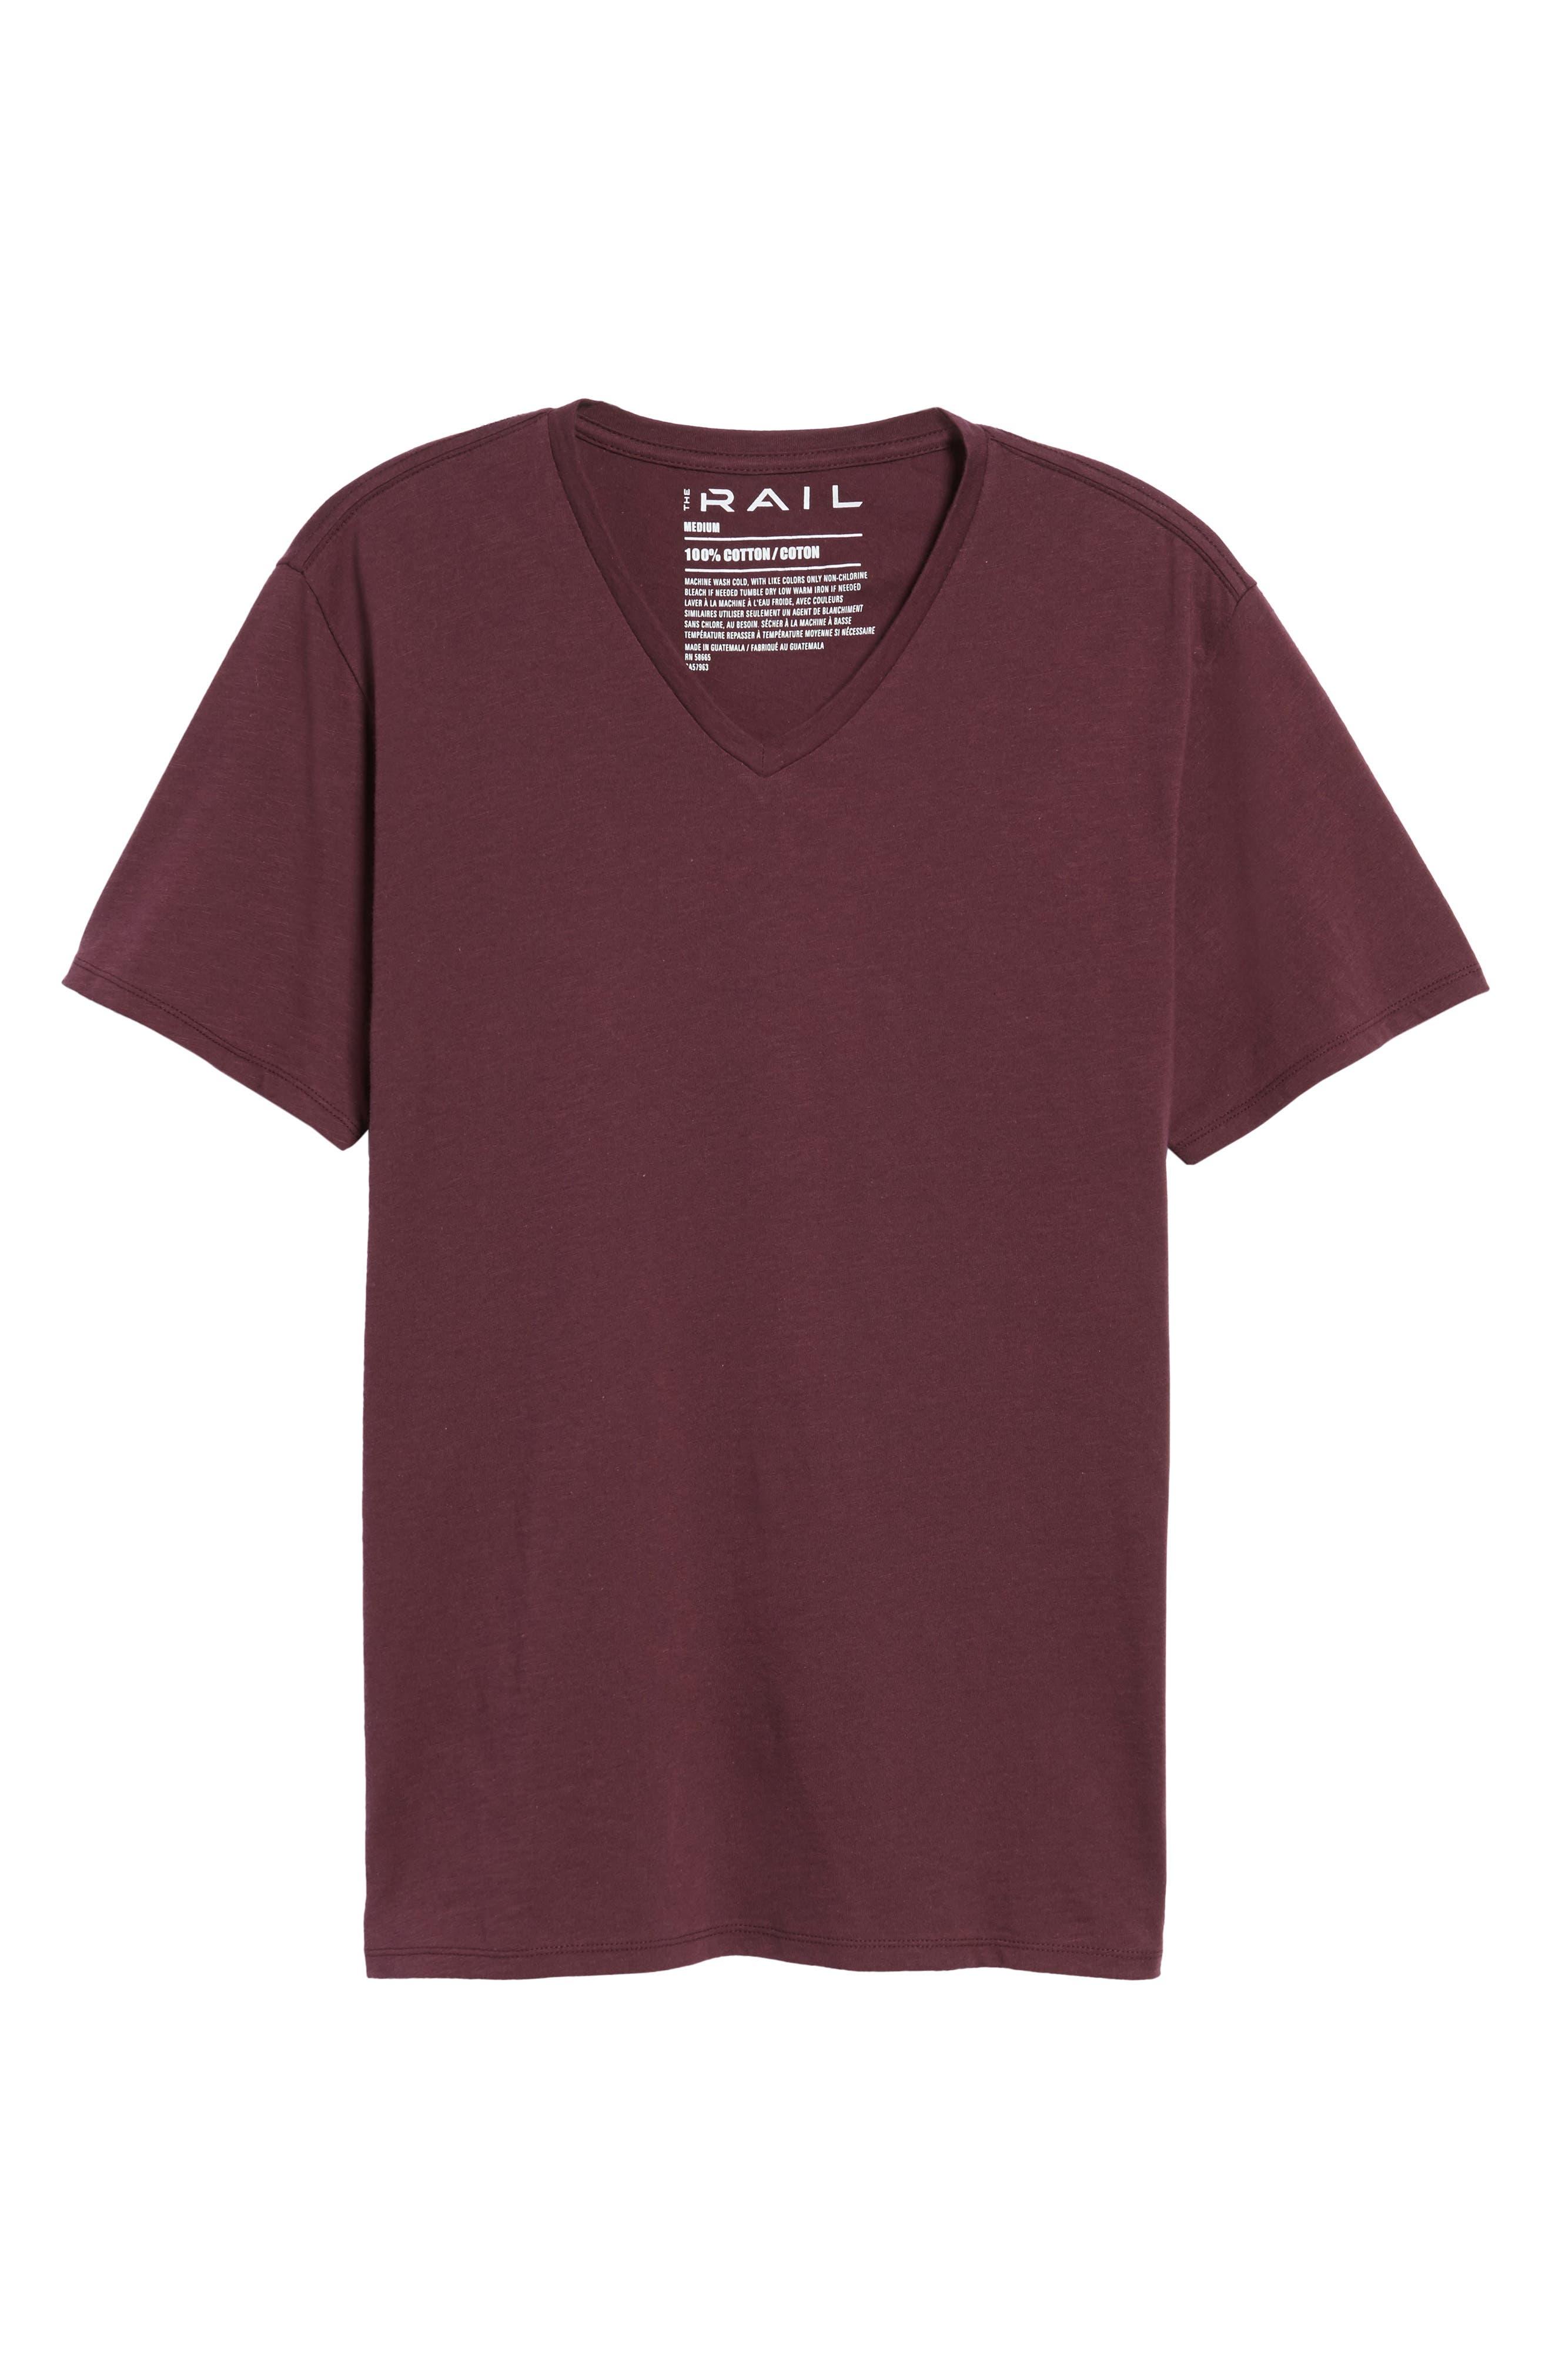 Alternate Image 6  - The Rail Slub Cotton V-Neck T-Shirt (2 for $30)